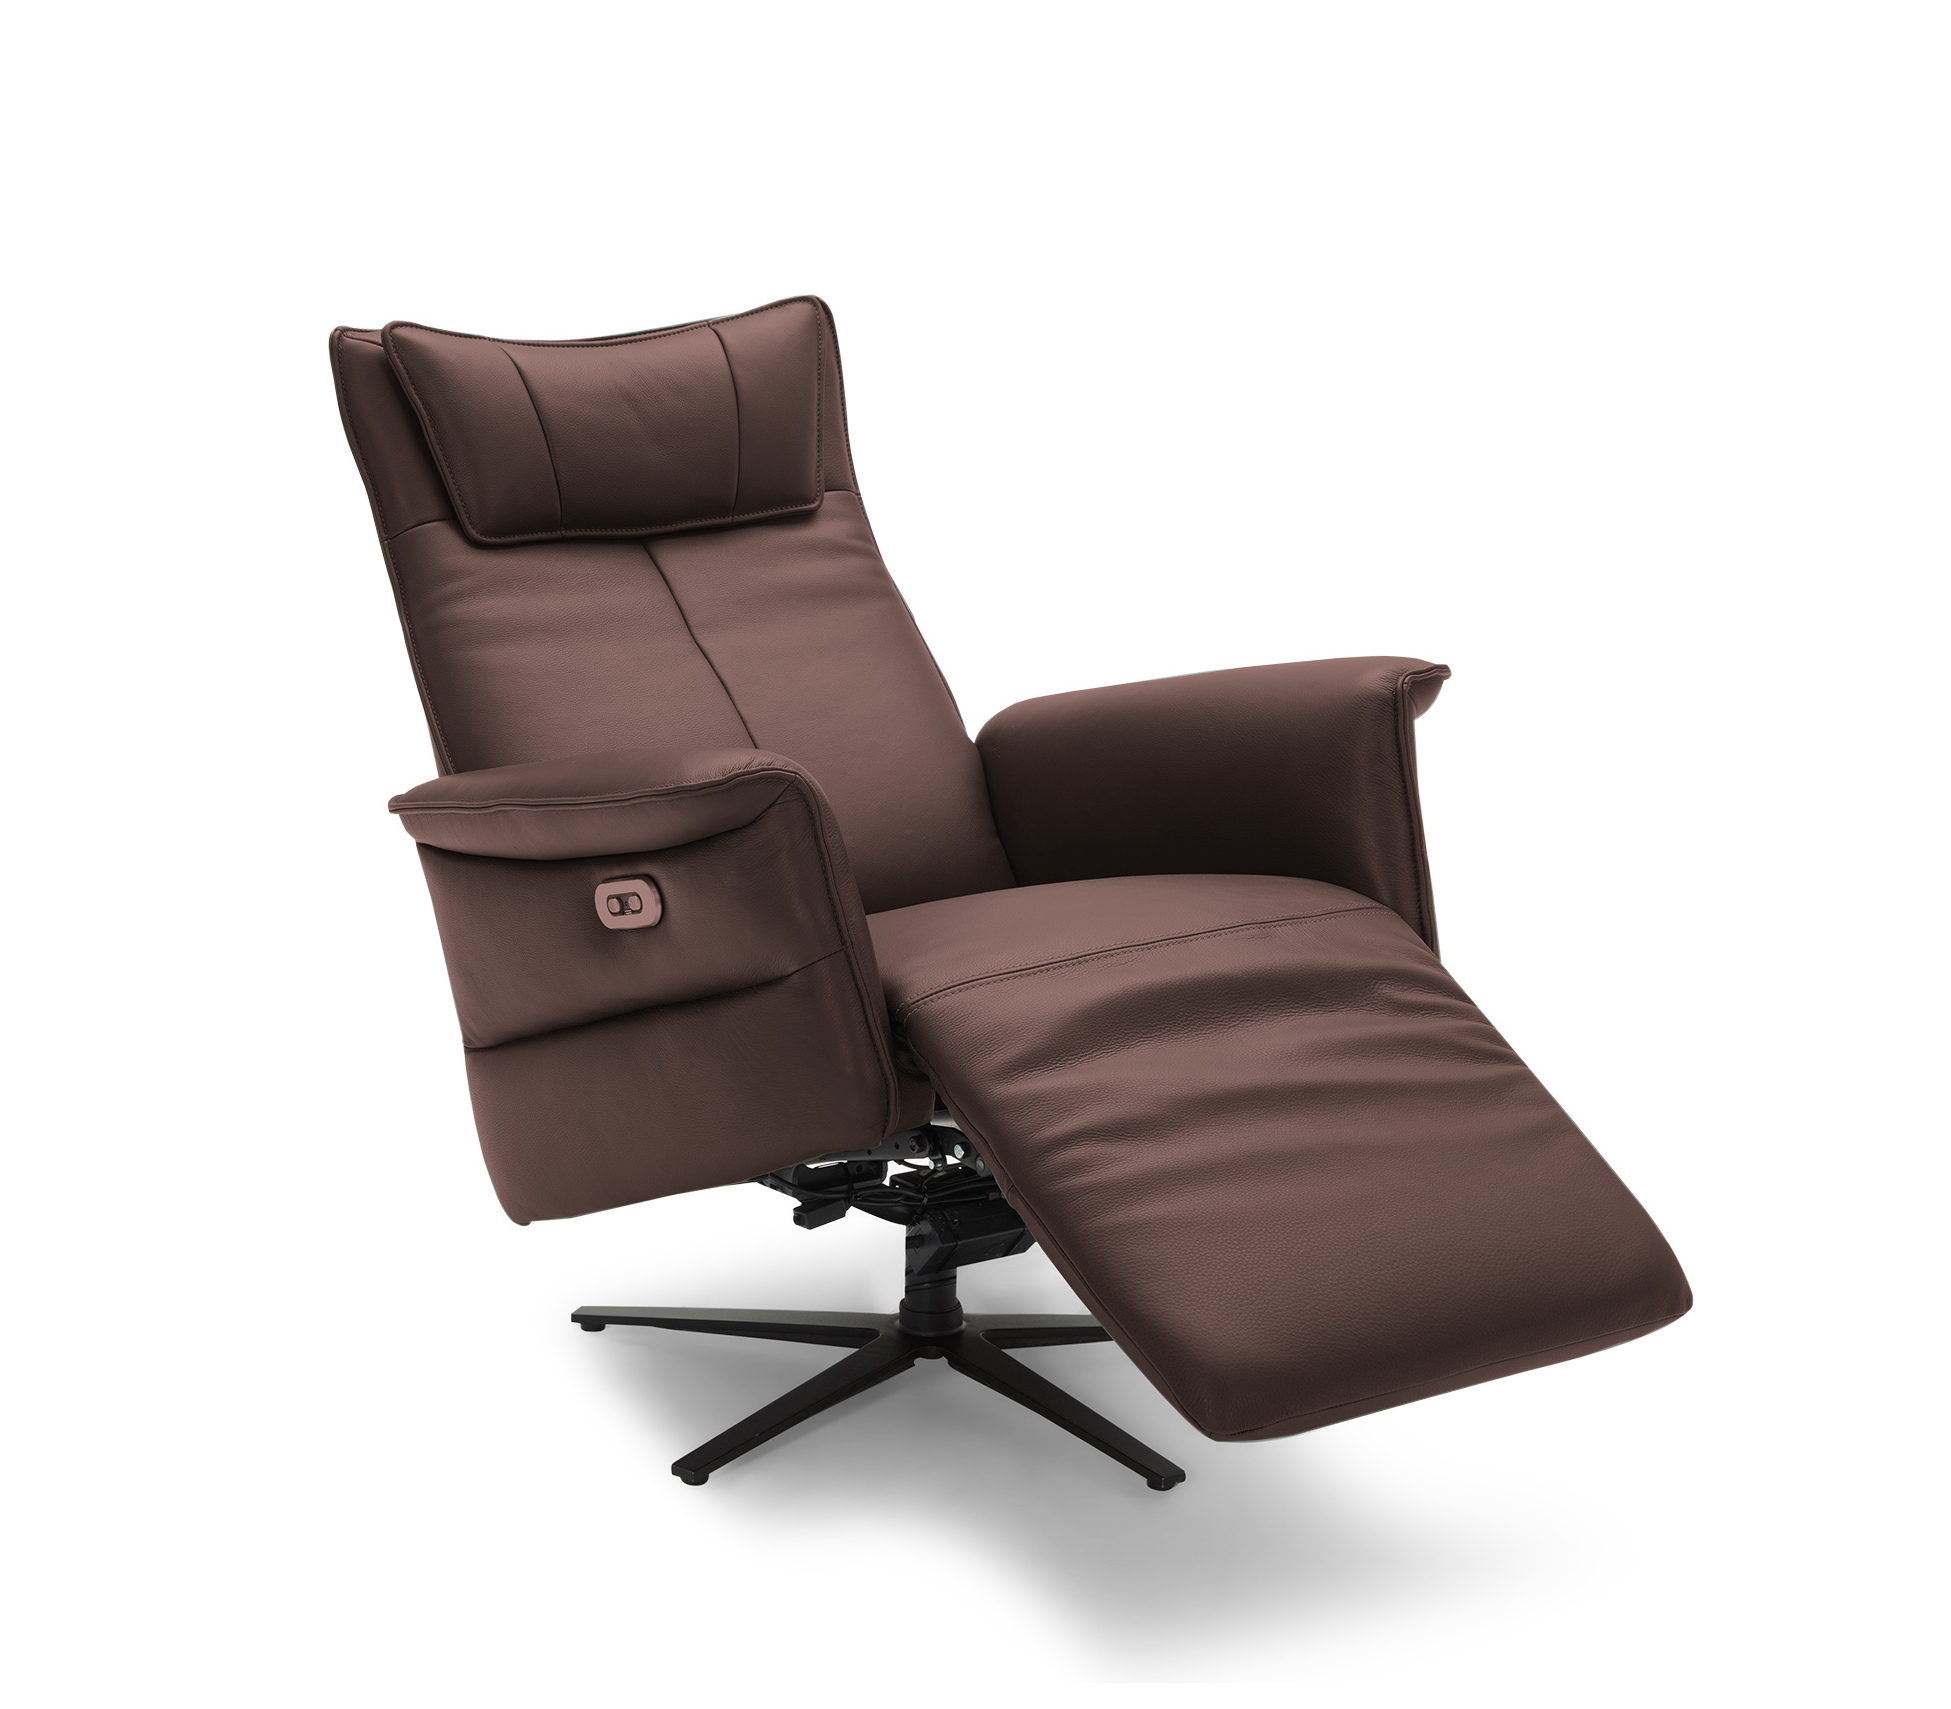 Marsalla Recliner Chair